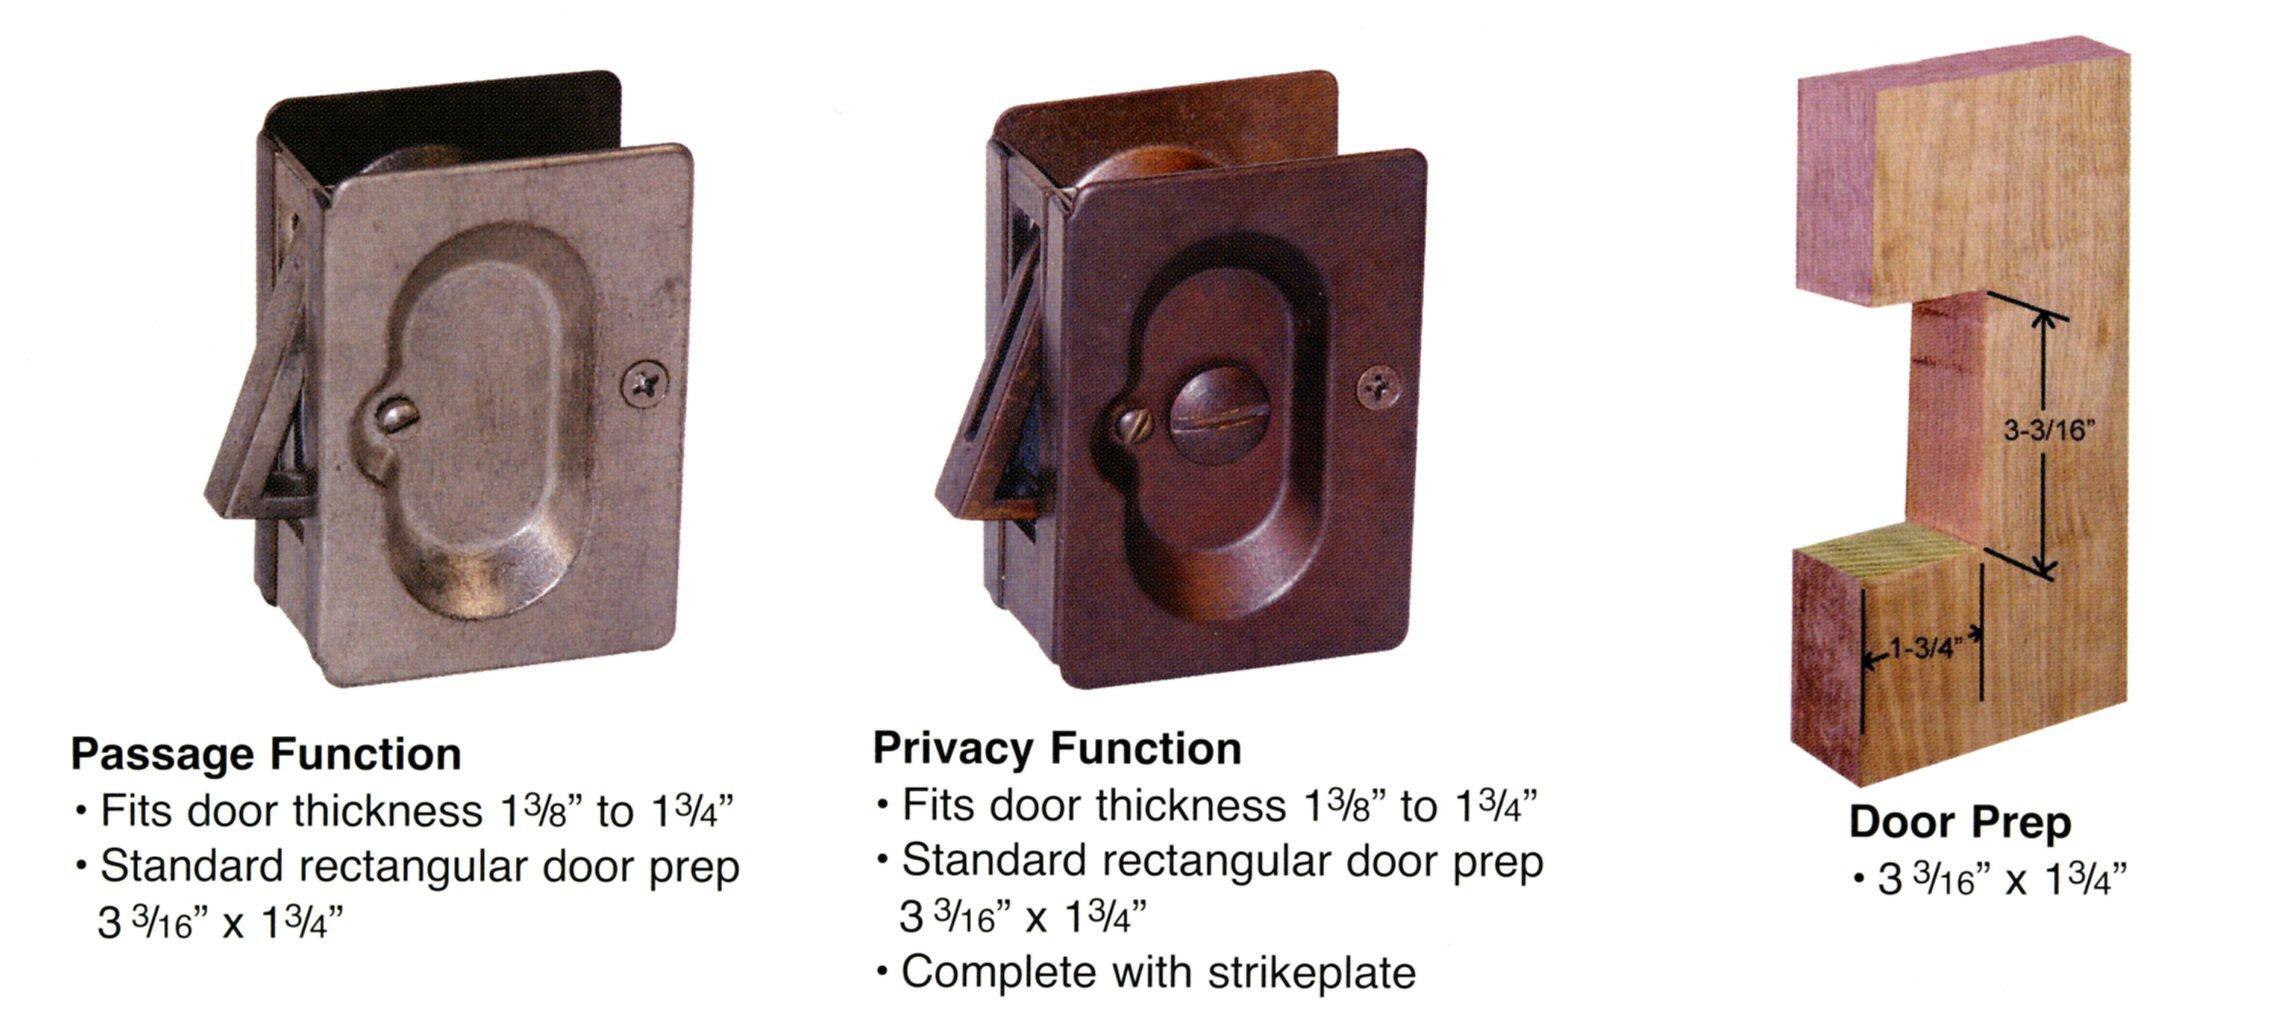 Irresistible Notch Prep Pocket Door Pulls Pocket Door Hardware By Emtek Emtek Pocket Door Hardware Installation Emtek Pocket Door Hardware Installation Instructions houzz 01 Emtek Pocket Door Hardware